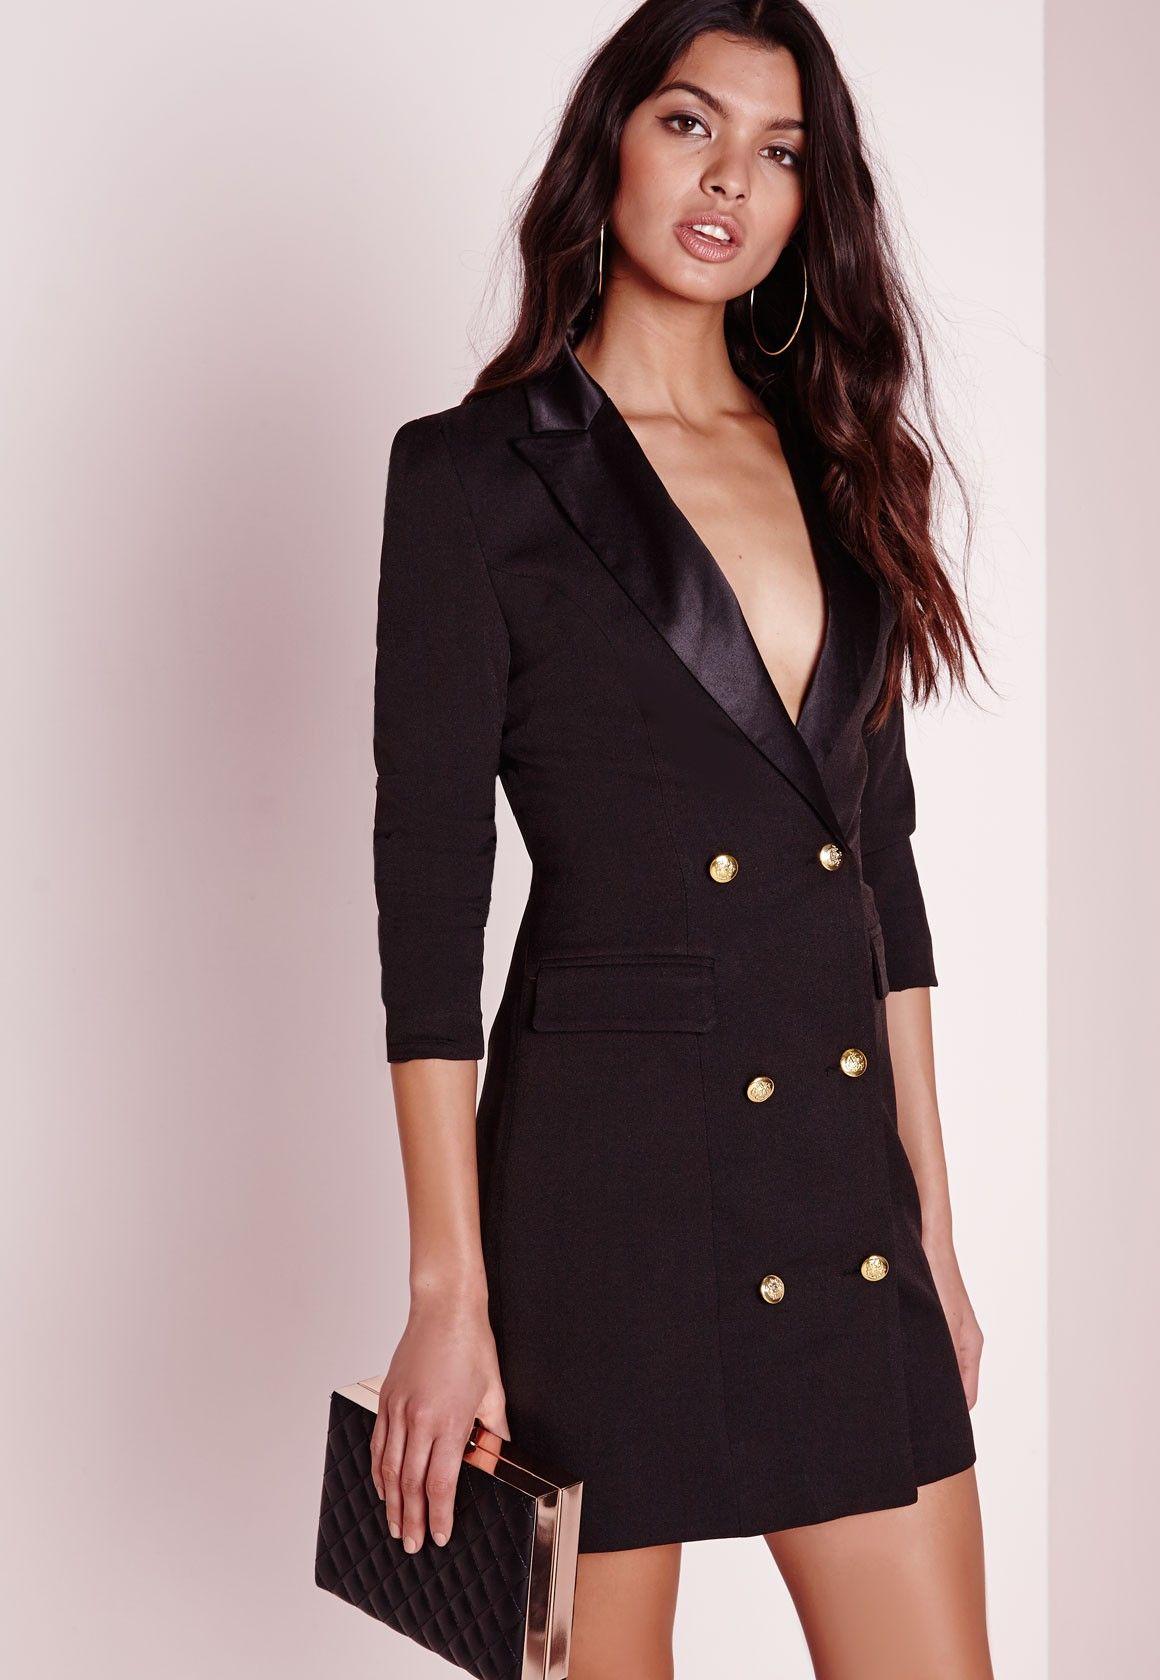 Missguided - Long Sleeve Tux Dress Black  6da58375f